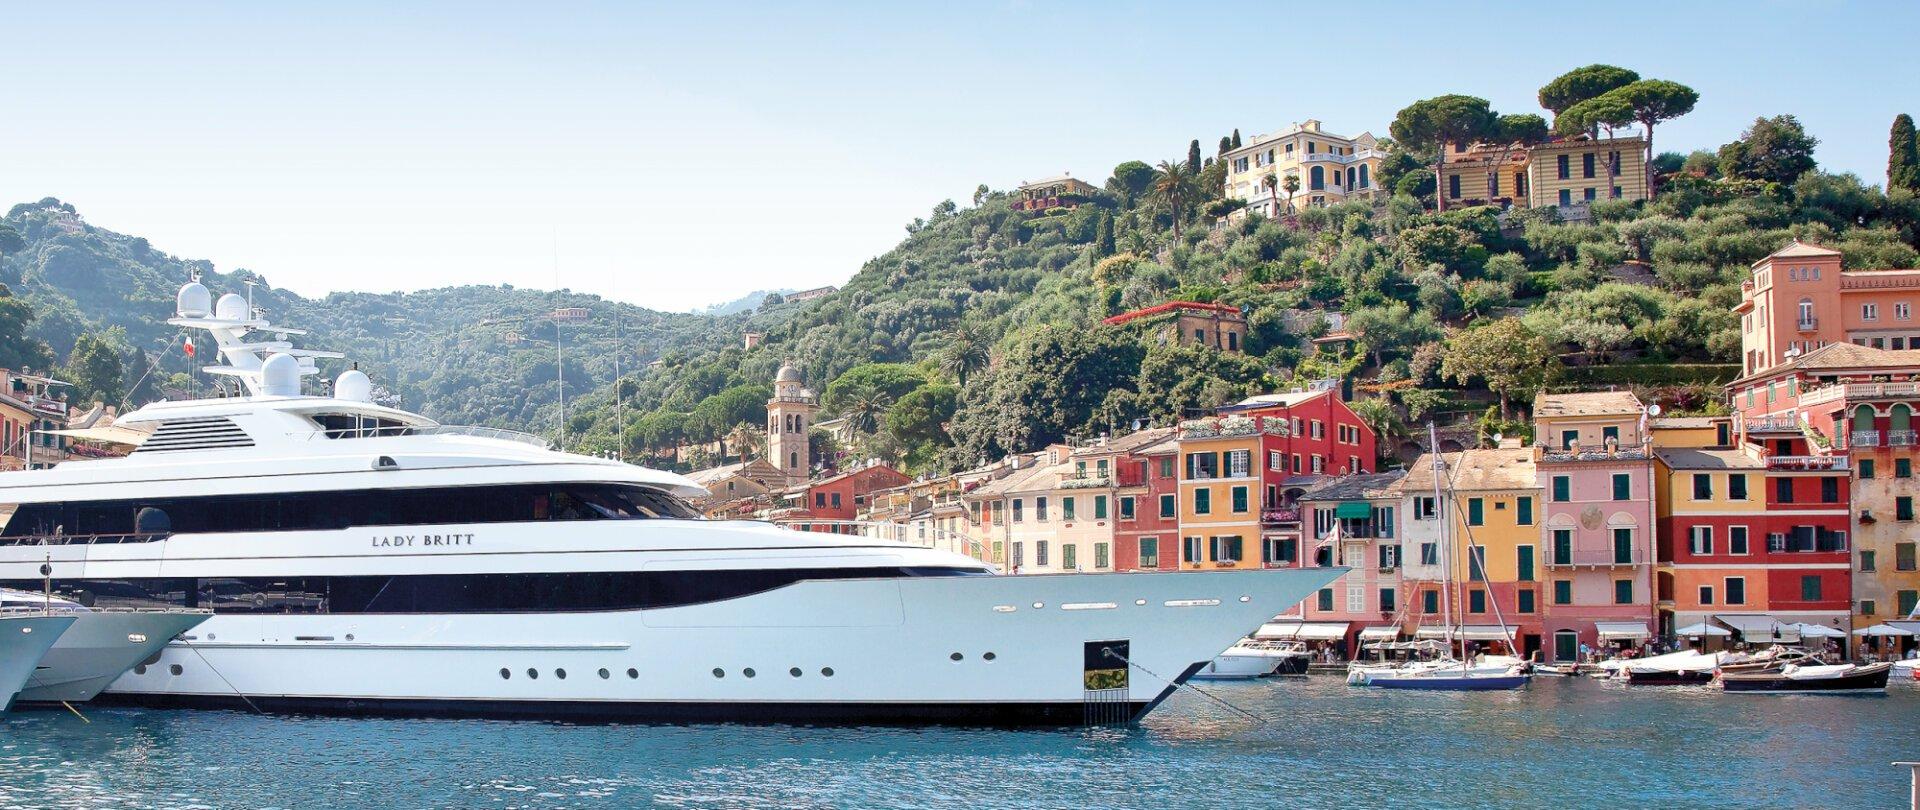 Lady Britt in an Italian port